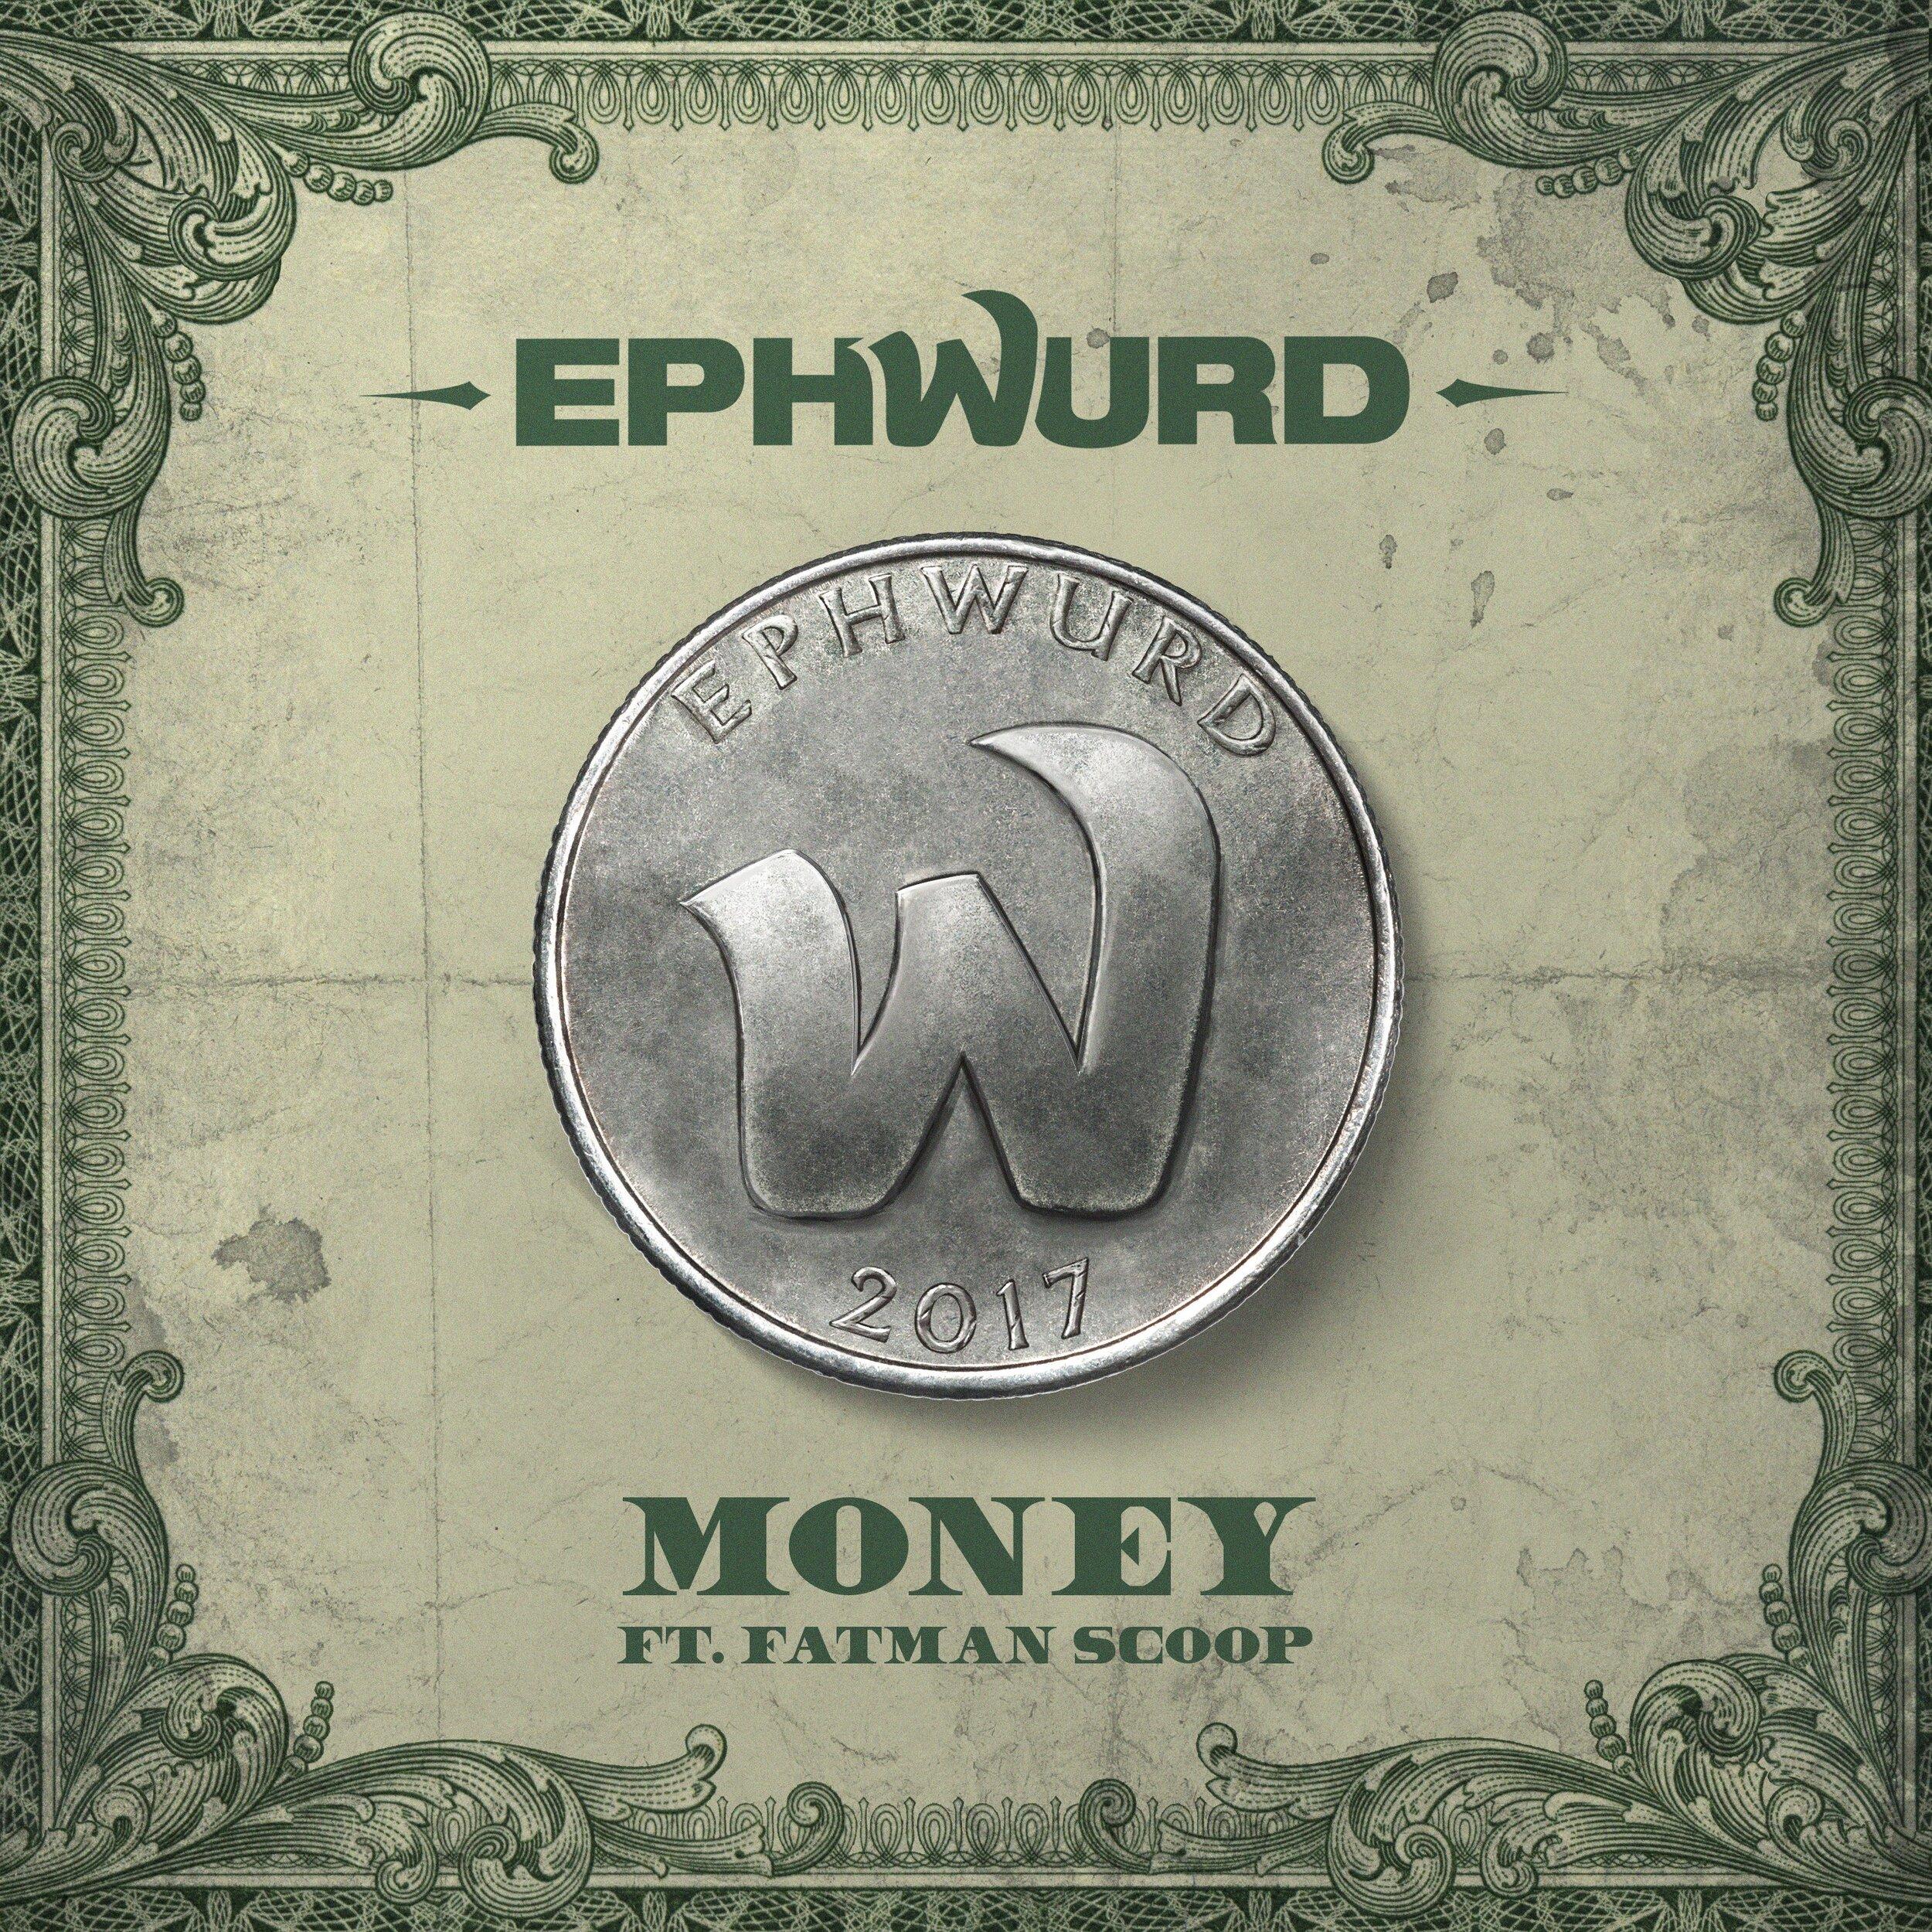 ephwurd-money-art.jpg